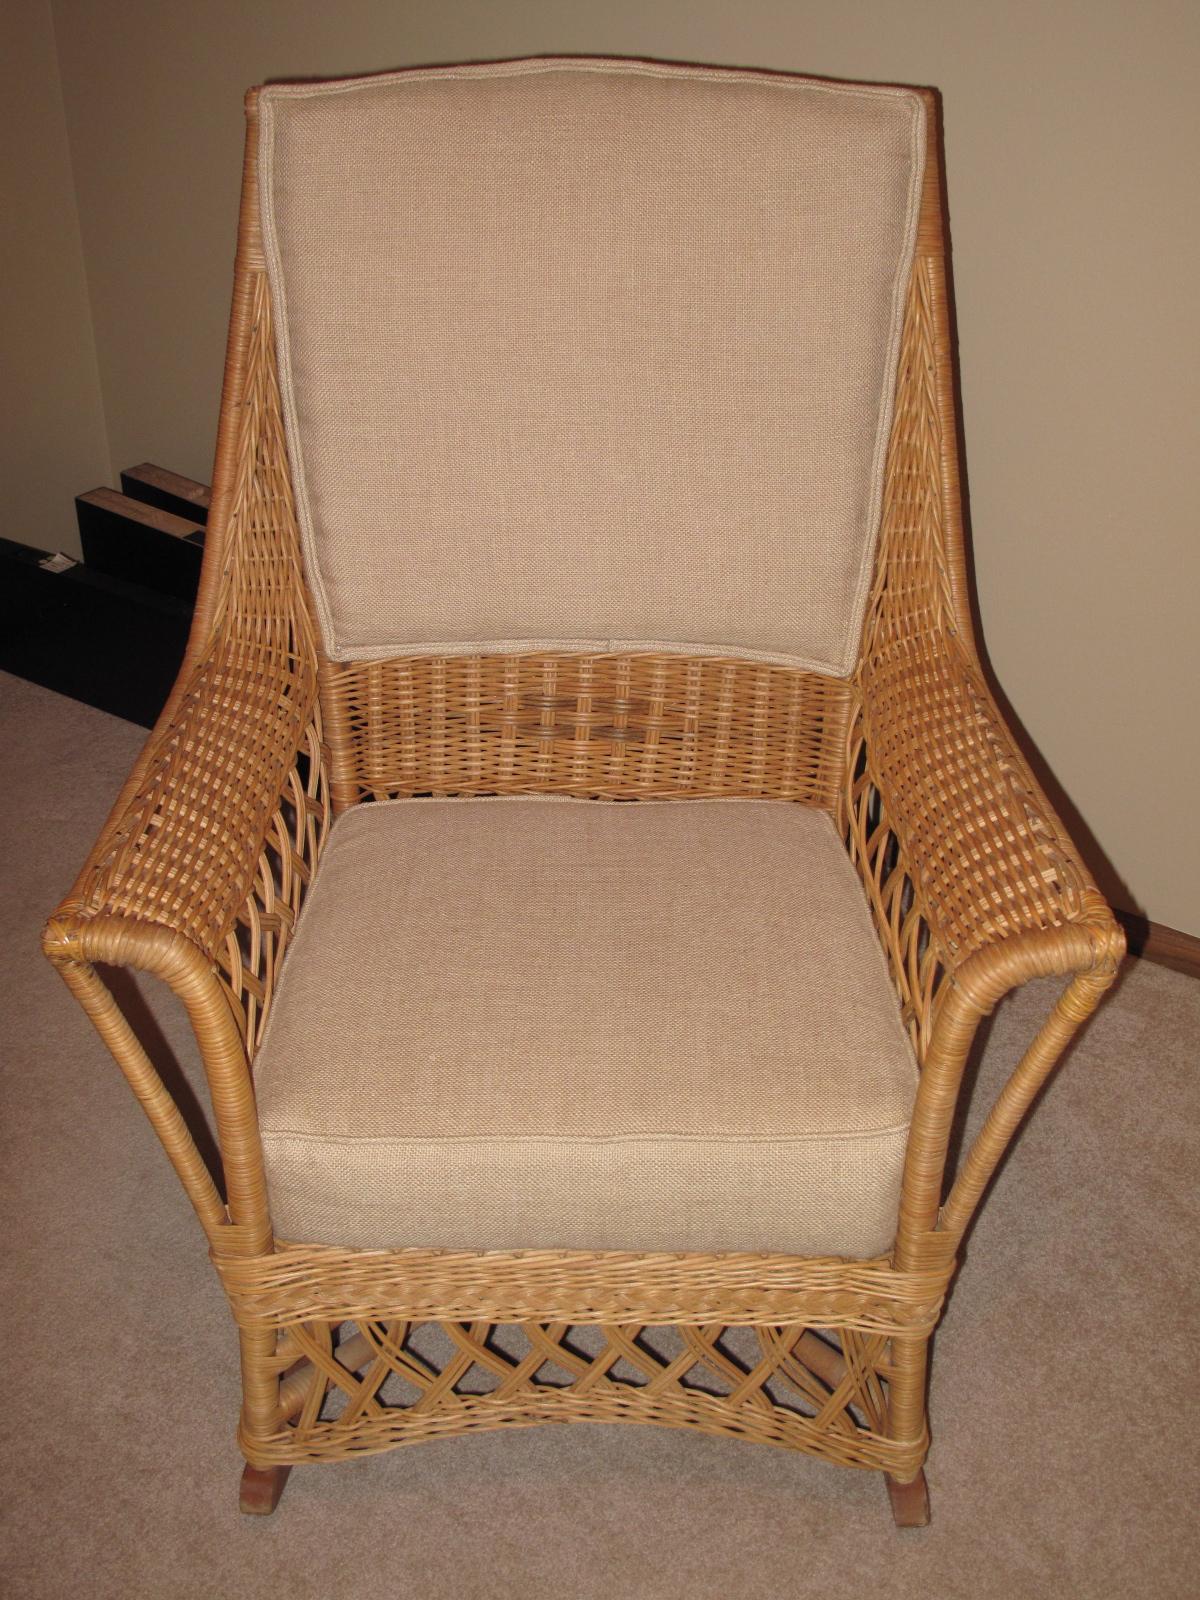 Ypsilanti Furniture Company Wicker Rocking Chair Antique